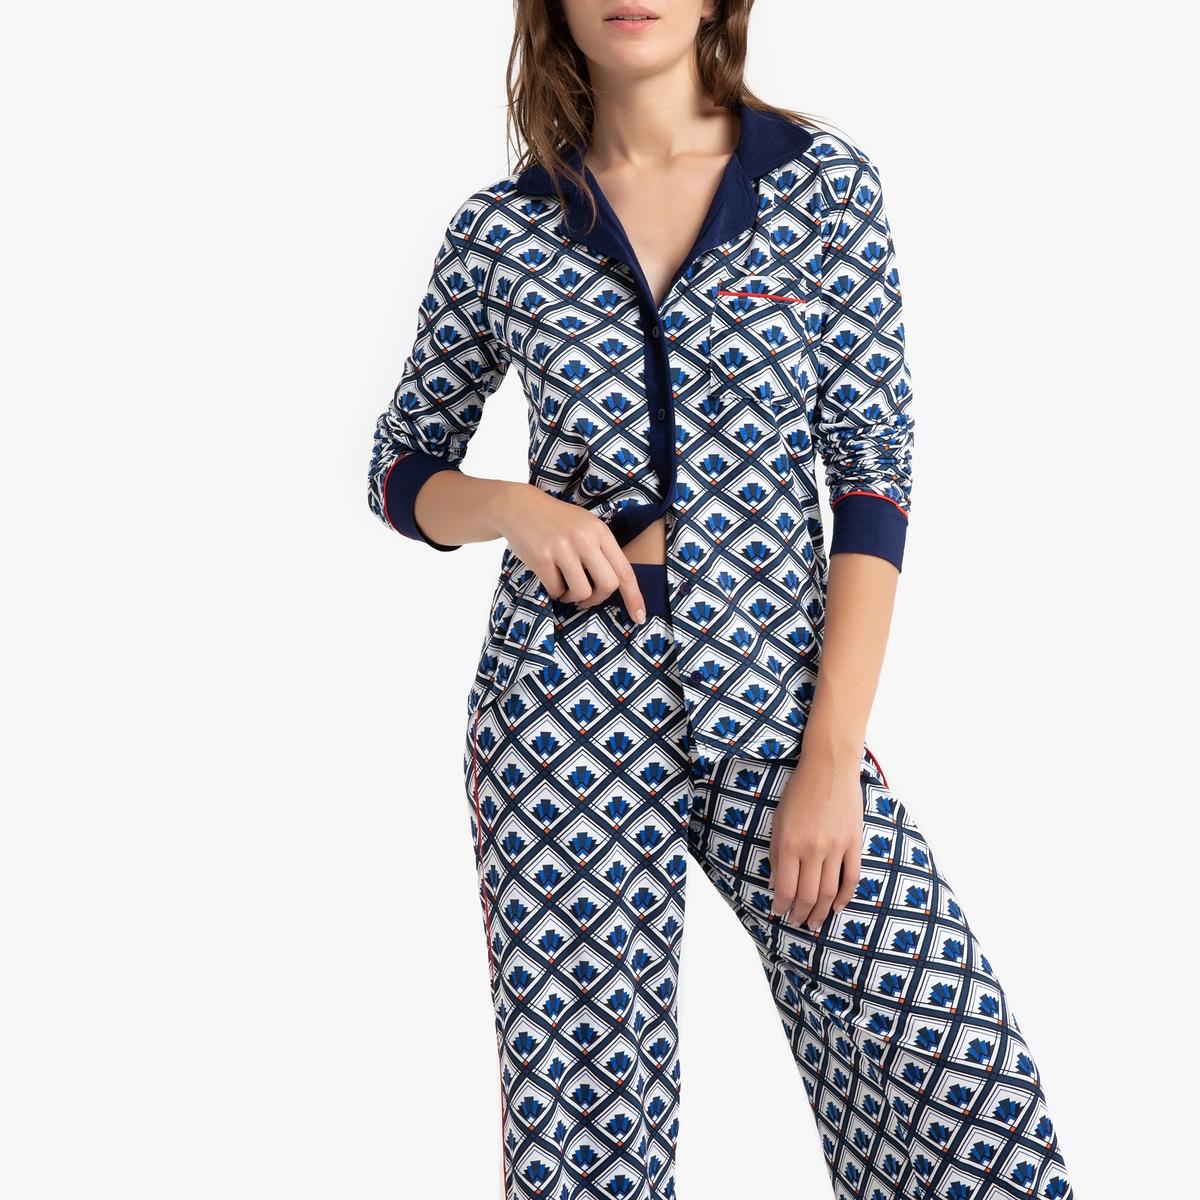 Пижама La Redoute Tie Design L синий